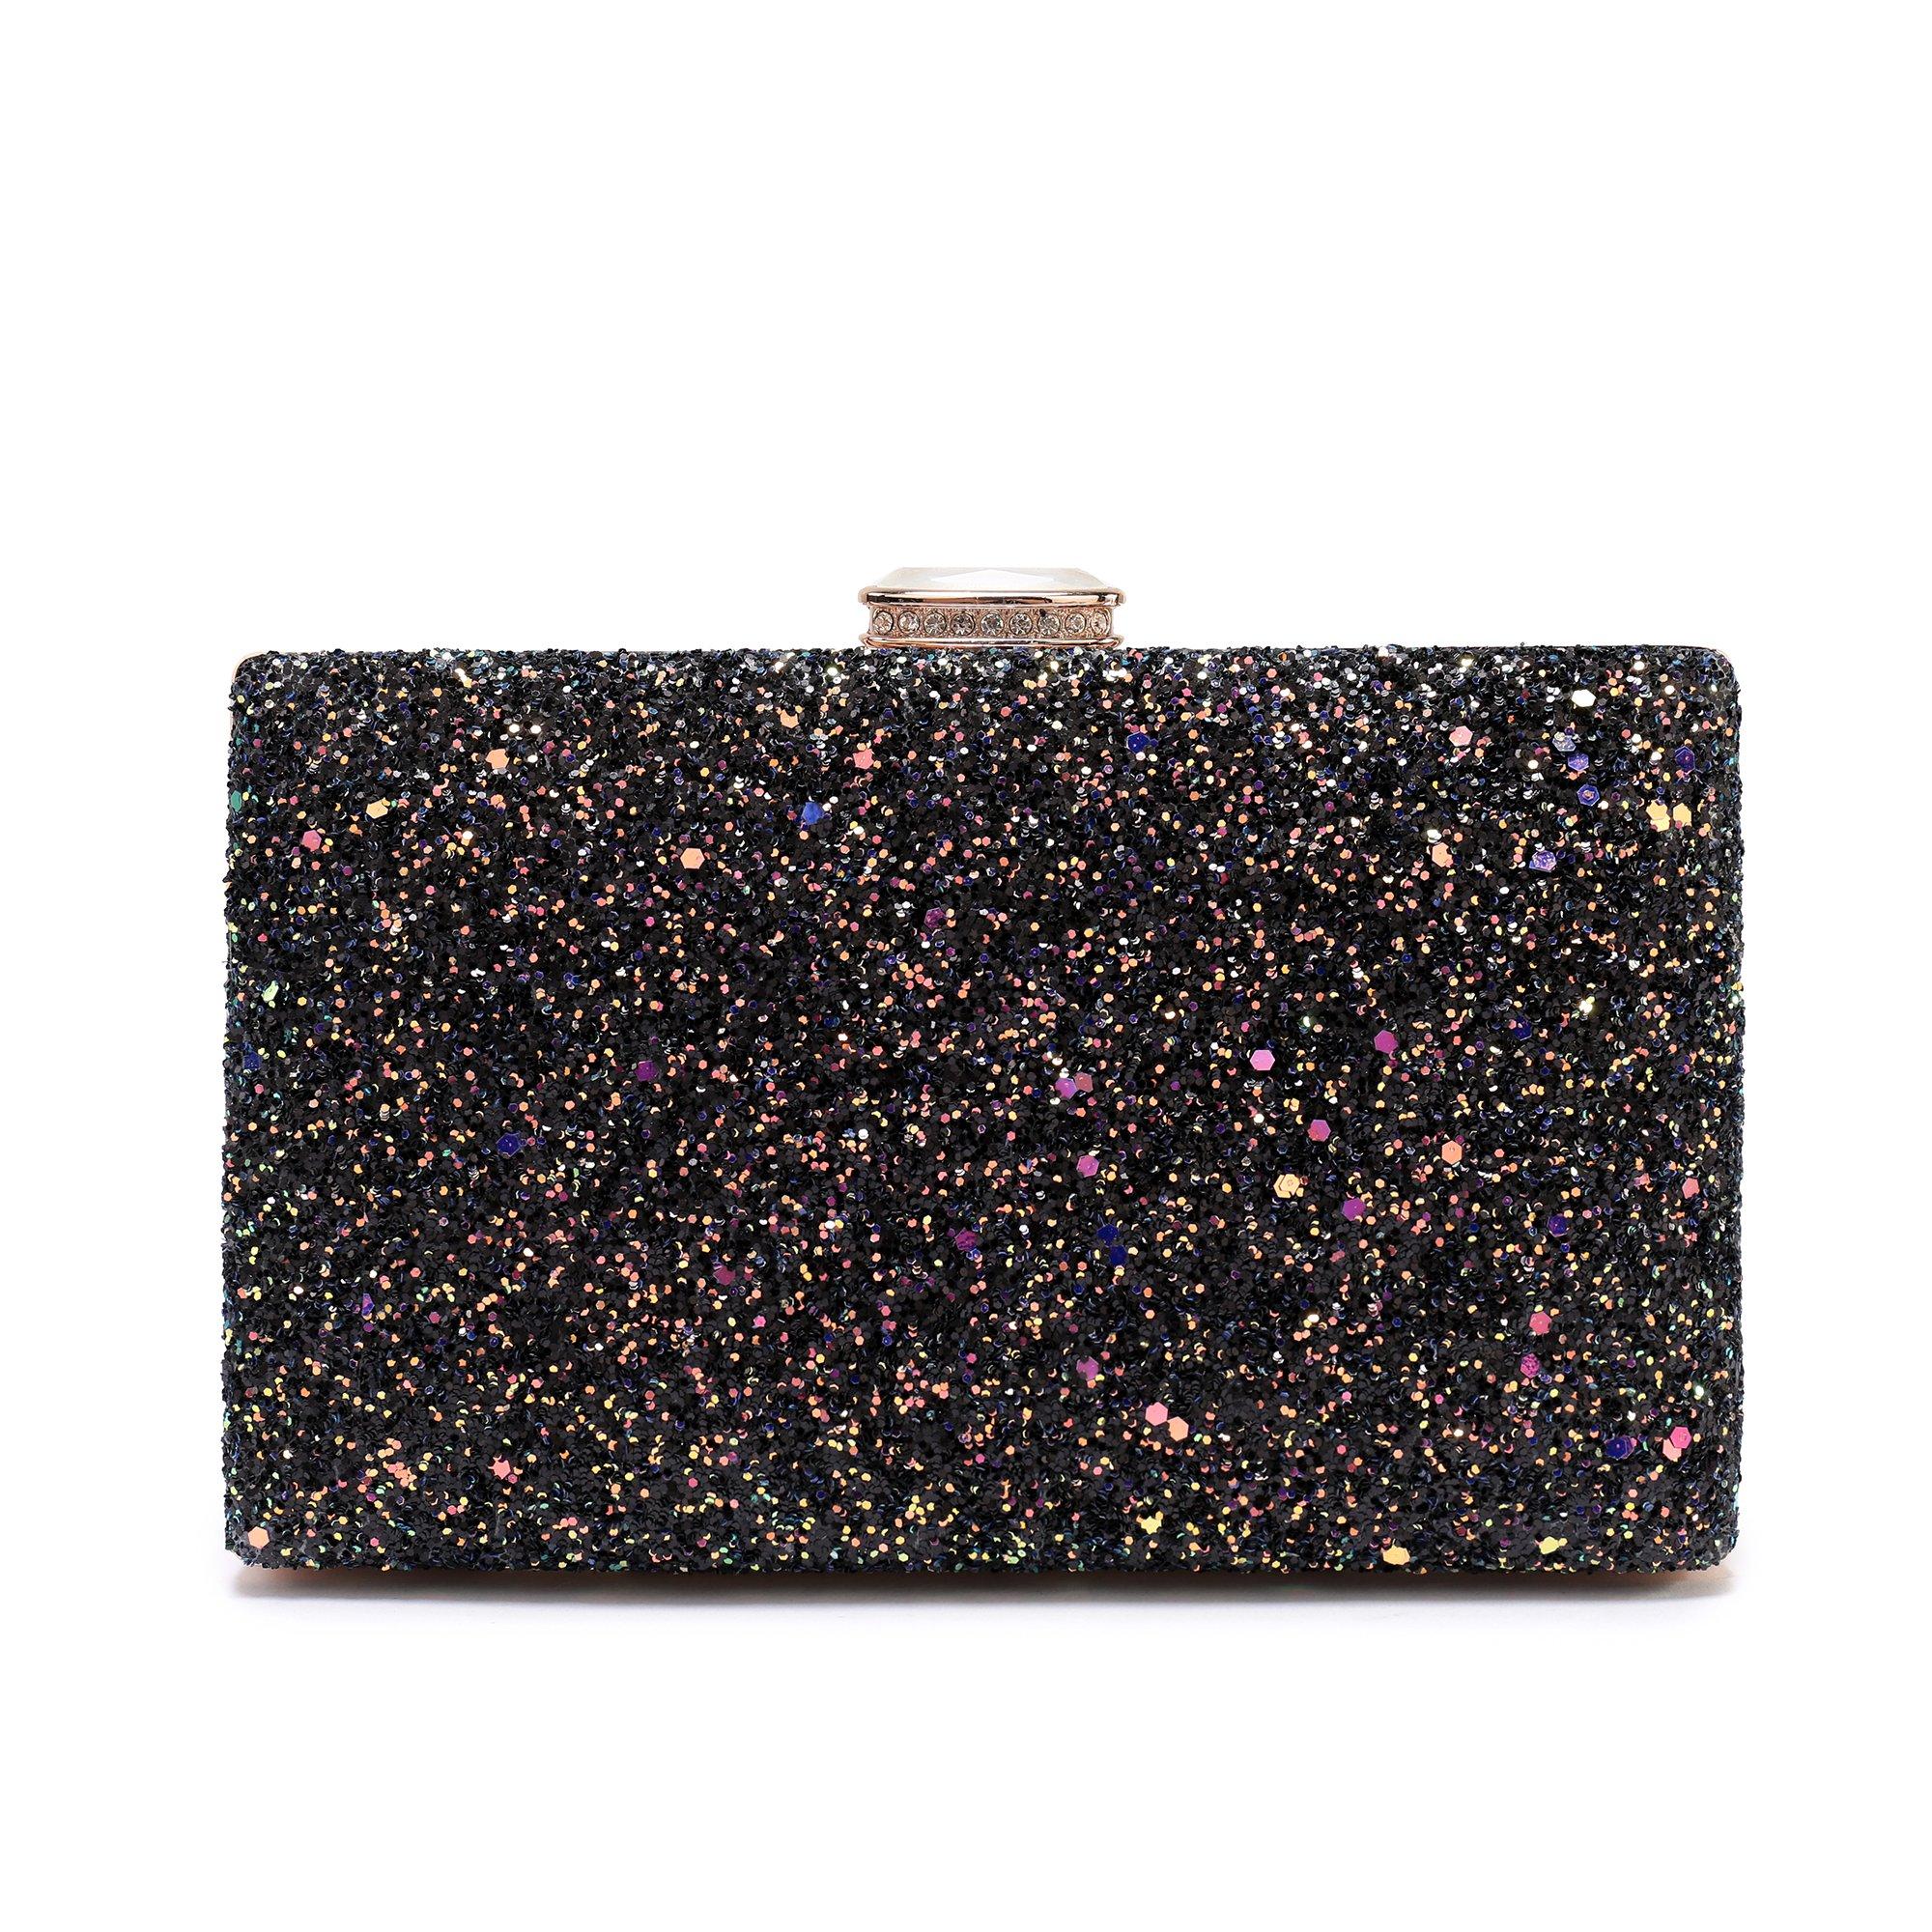 Women's Elegant Sparkling Glitter Evening Clutch Bags BlingEvening Handbag Purses For Wedding Prom Bride(Black)